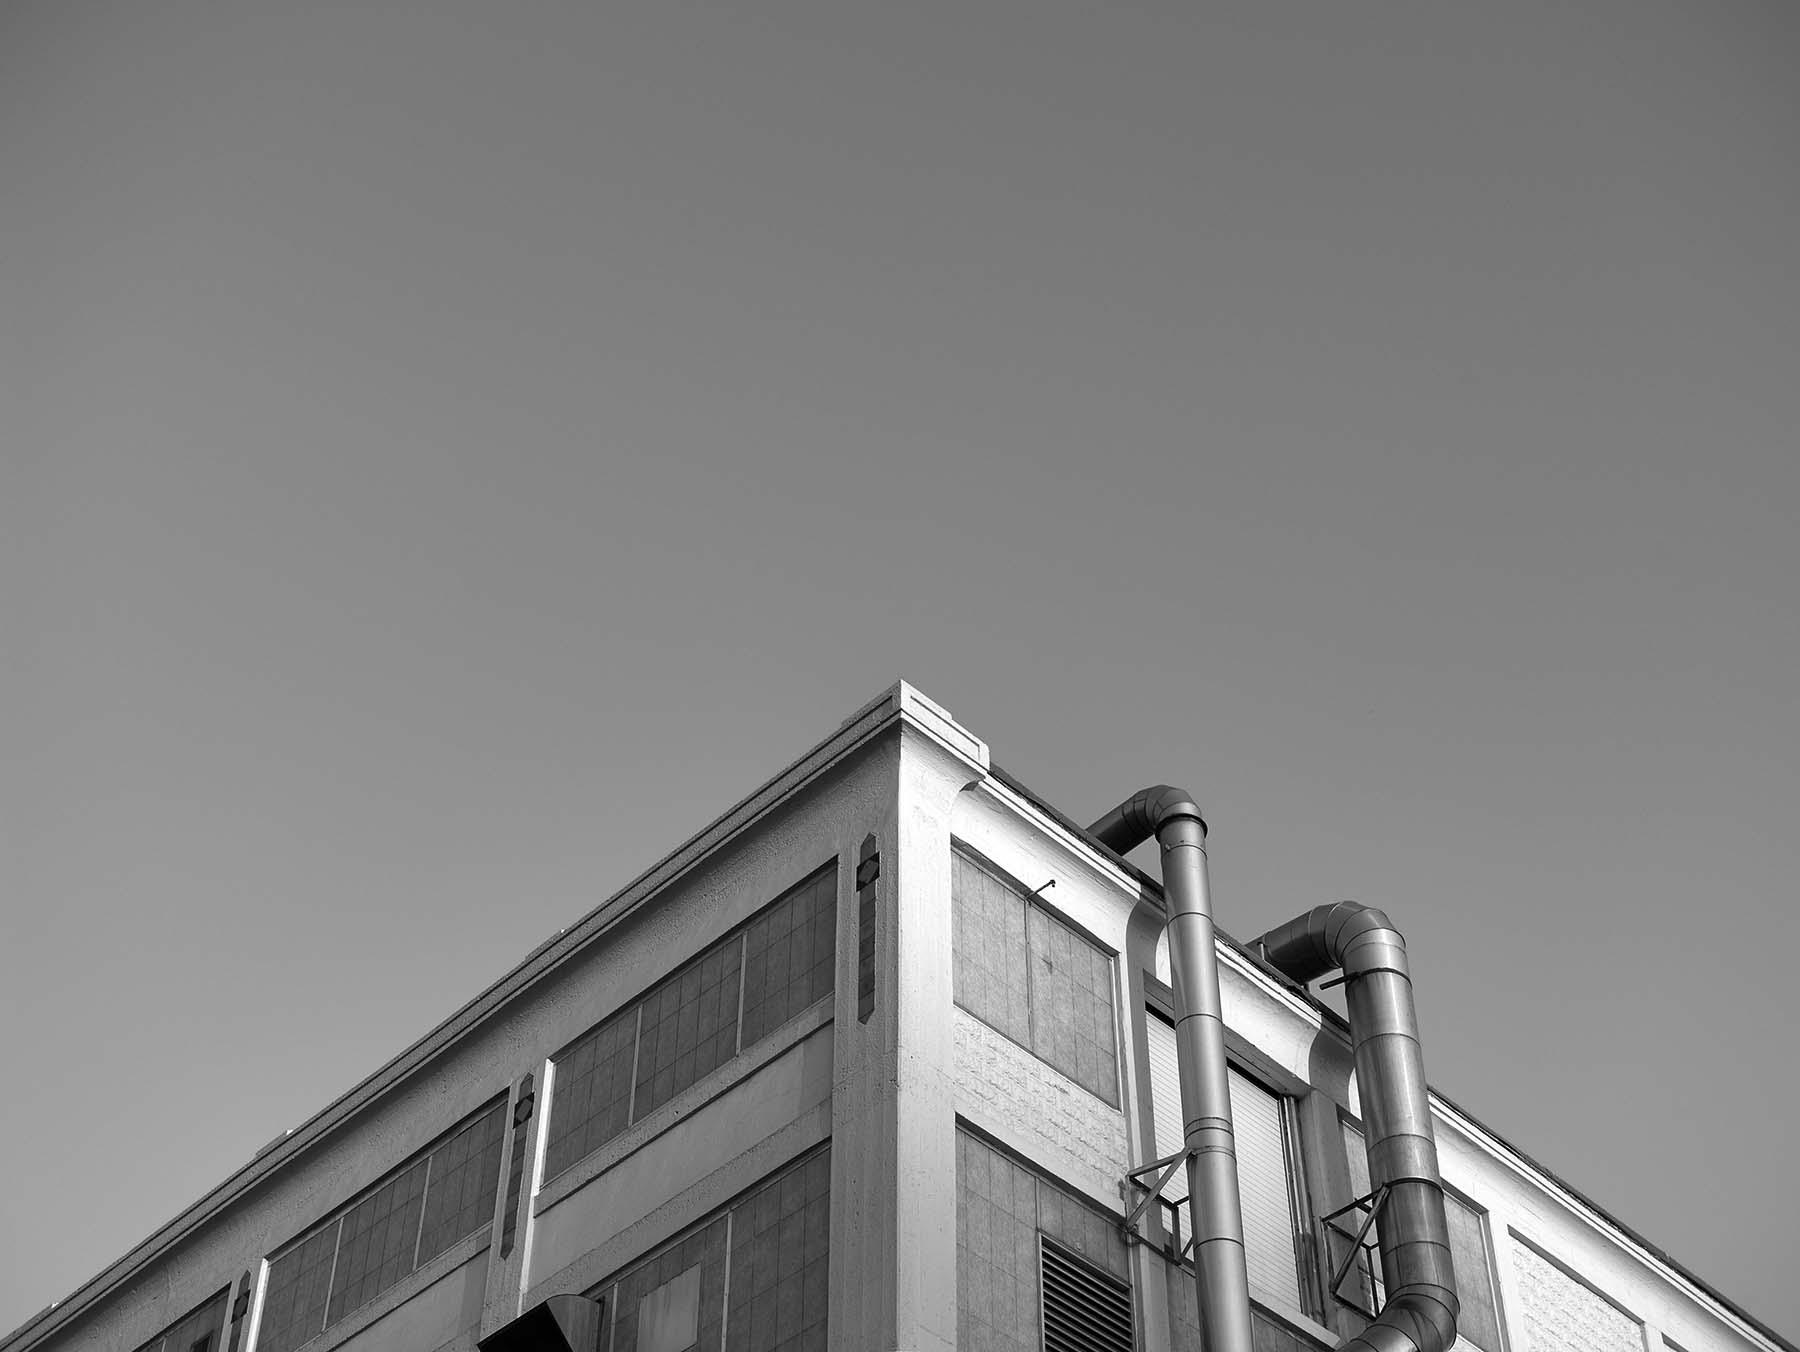 Tootsie Roll Factory, Cambridge USA